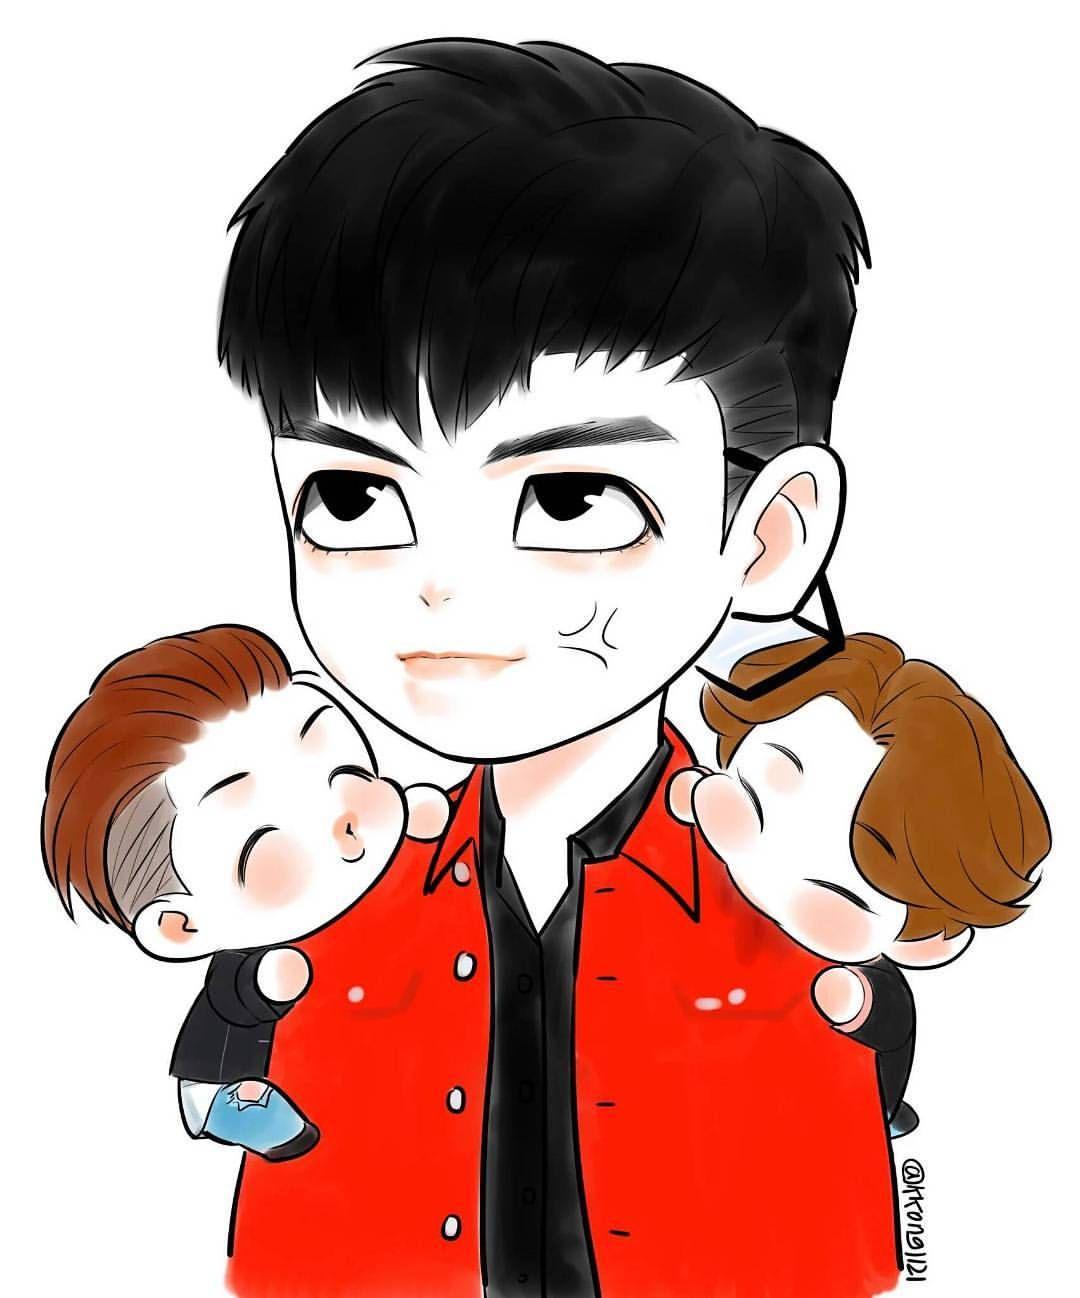 Cute [FanArt] @__youngbae__ @choi_seung_hyun_tttop h . #BIGBANG #choiseunghyun #TOP #dongyoungbae #Taeyang #kangdaesung #TOPSTYLE #epicface ©logo